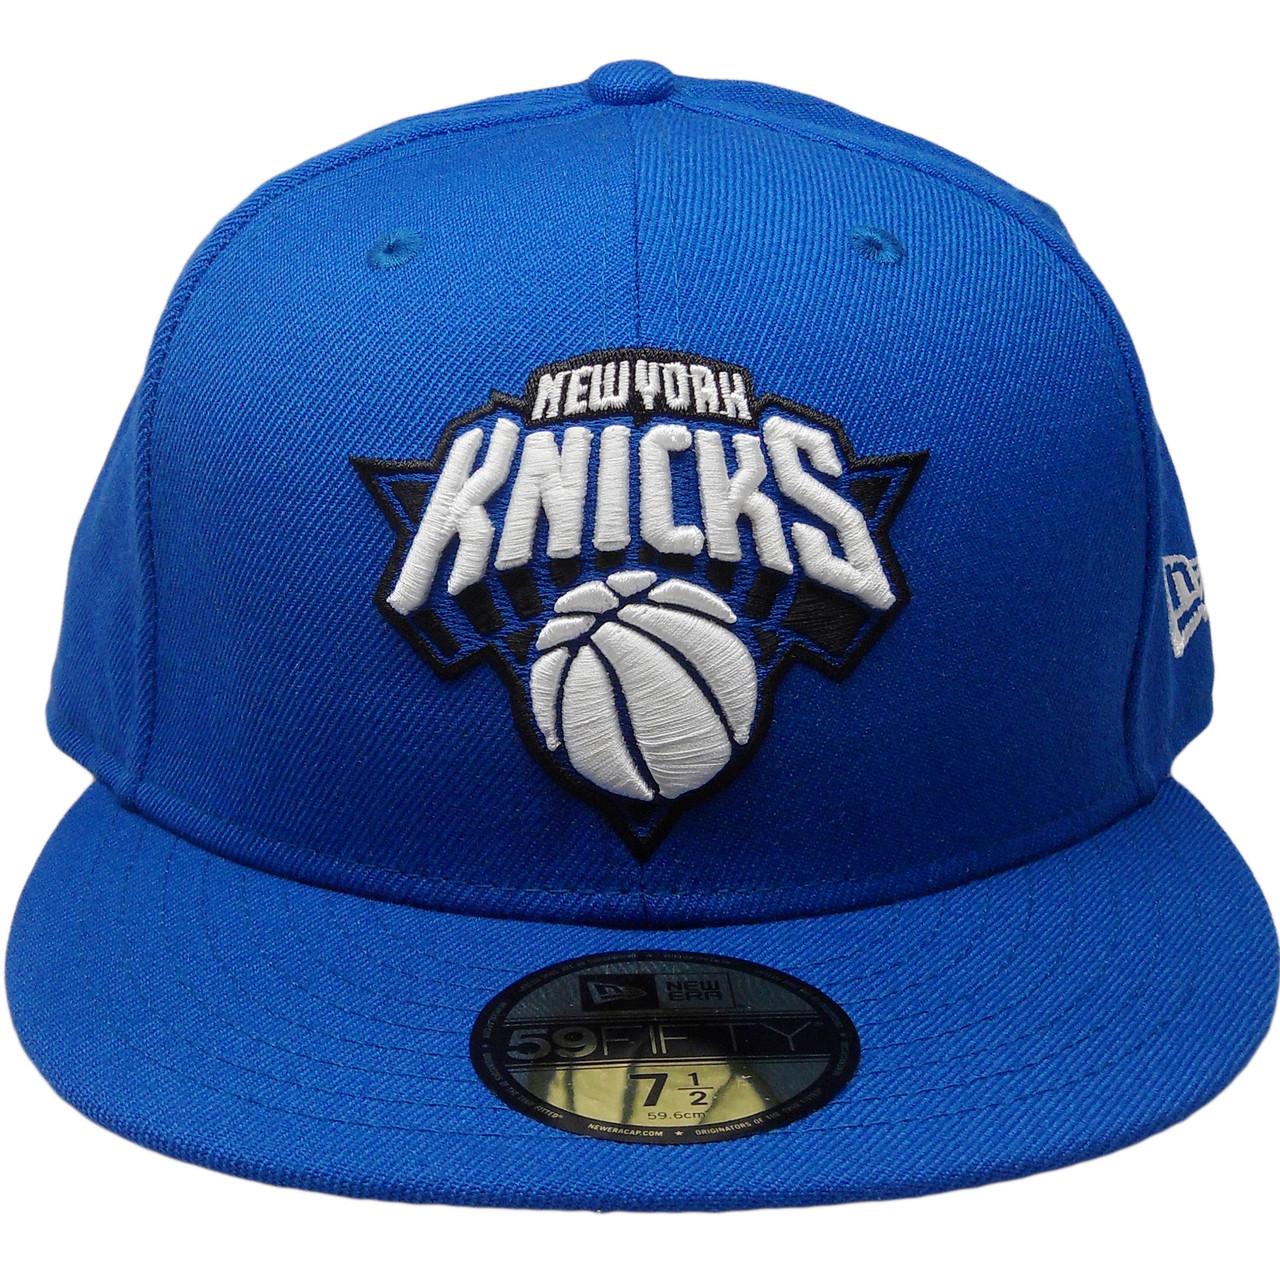 fb86ba4c1d9 New York Knicks New Era Custom 59Fifty Fitted - Royal